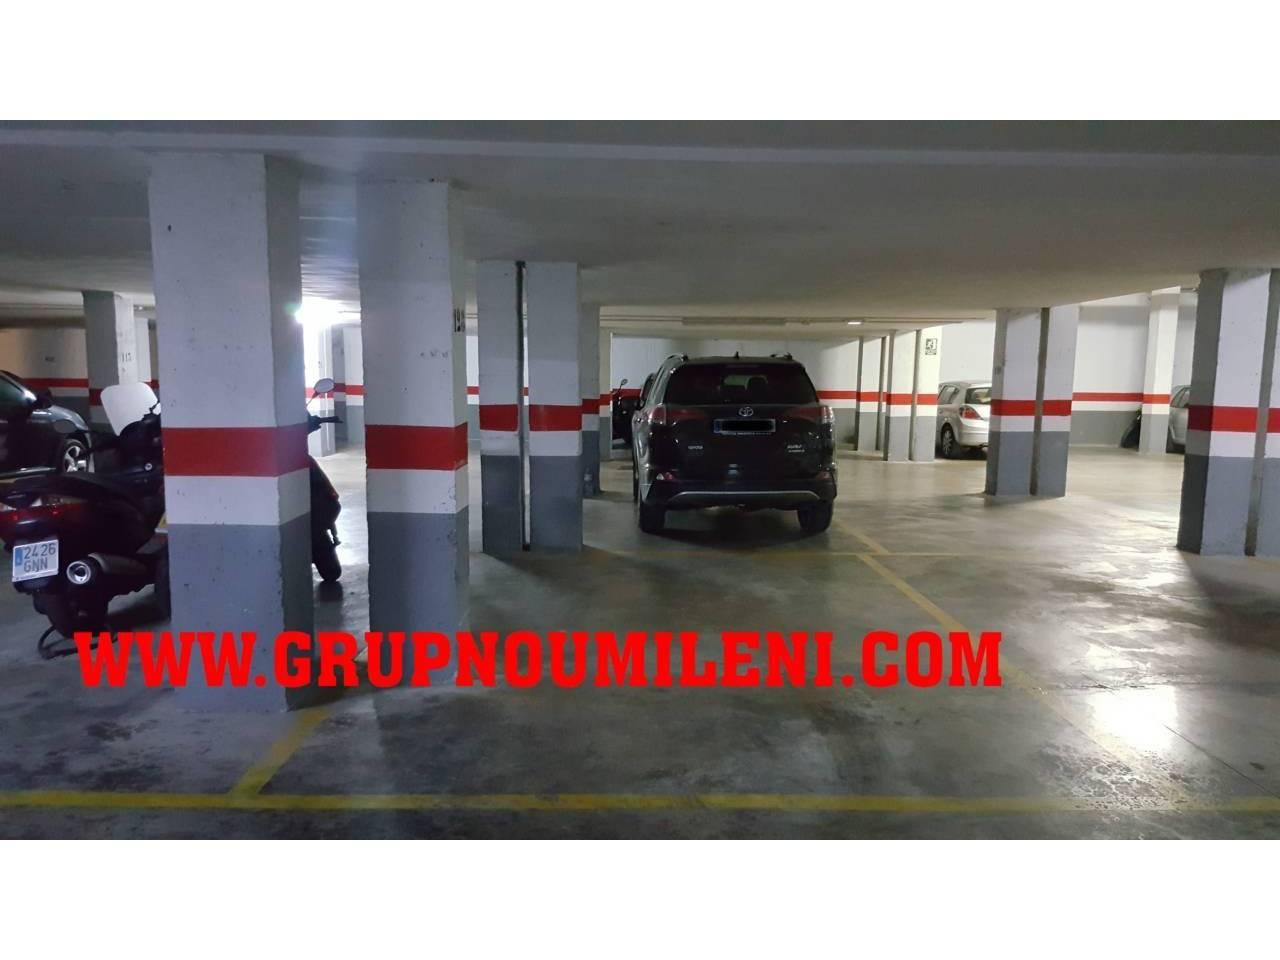 Lloguer Aparcament cotxe en Catarroja. Superf. 6 m², 1 plazas, subterráneo, columnas laterales, traster